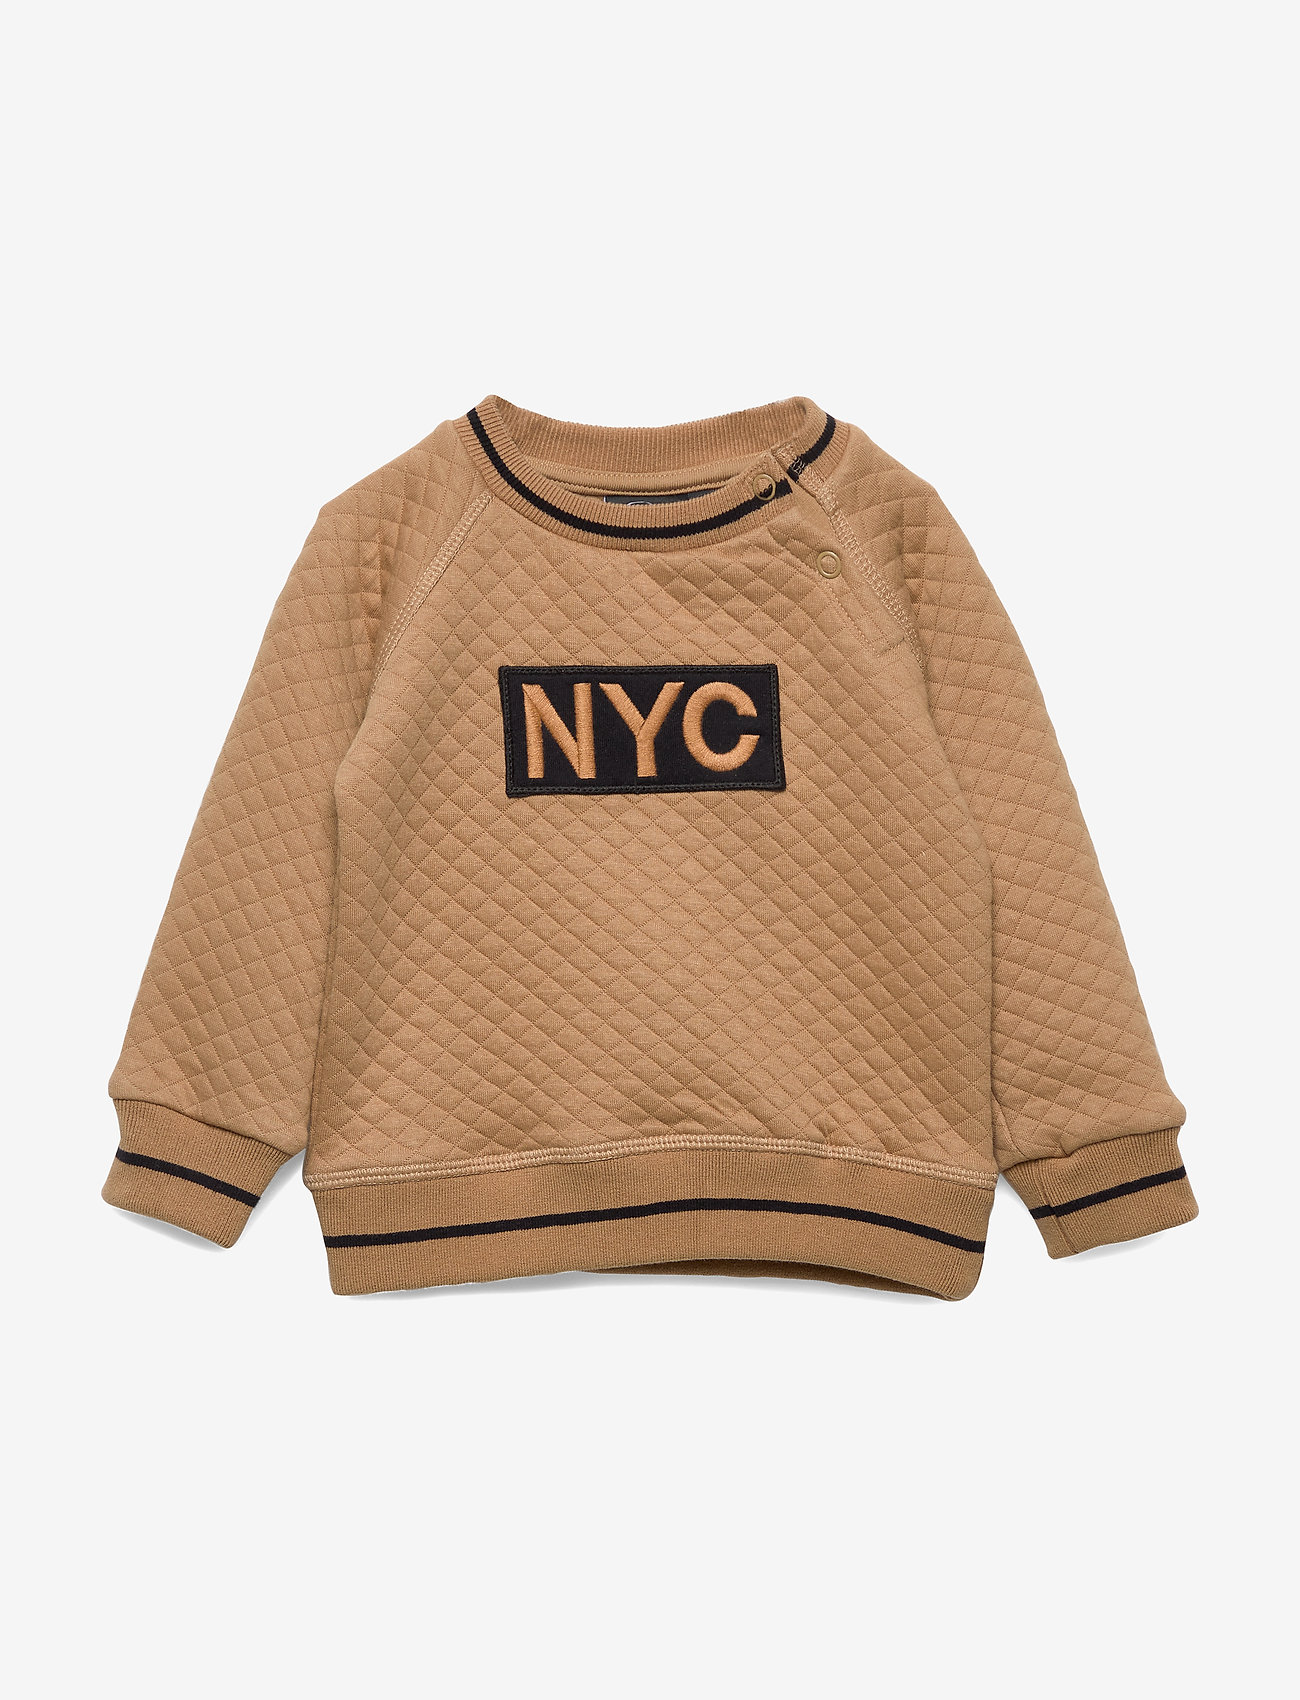 Petit by Sofie Schnoor - Sweat NYC - sweatshirts - camel - 0